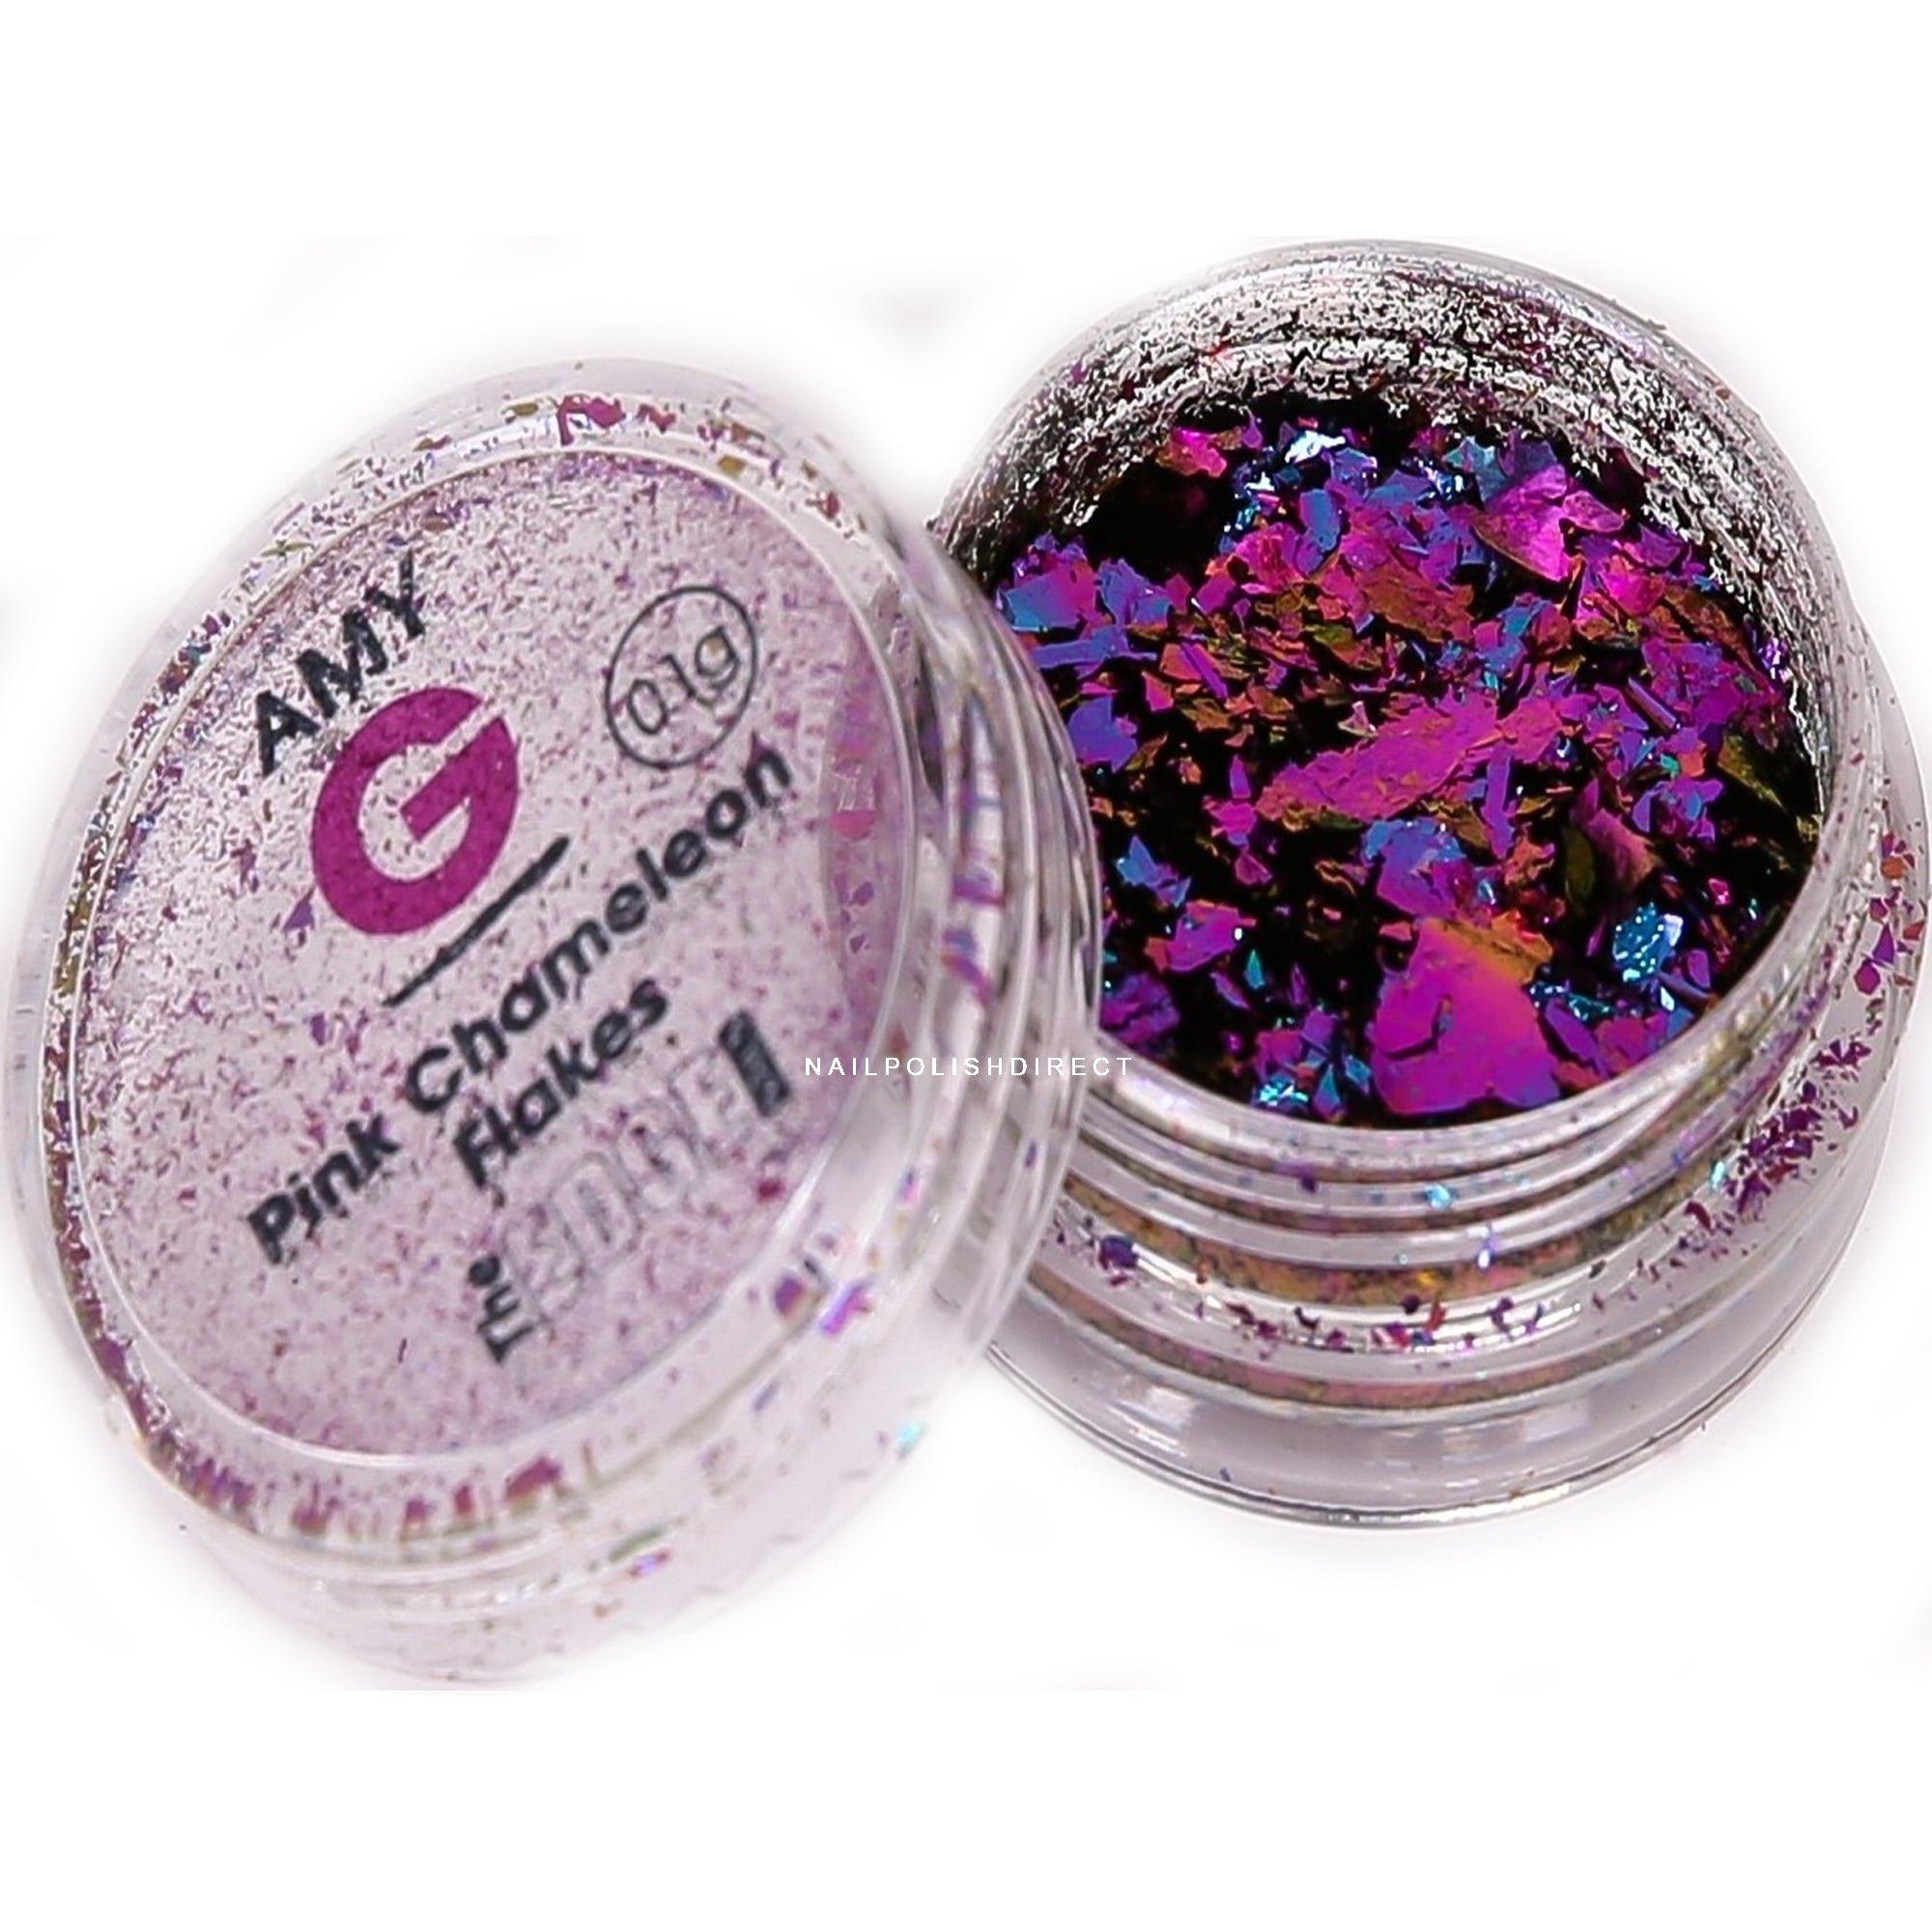 Amy G Chameleon Nail Art Flakes Pink 01g 3003020